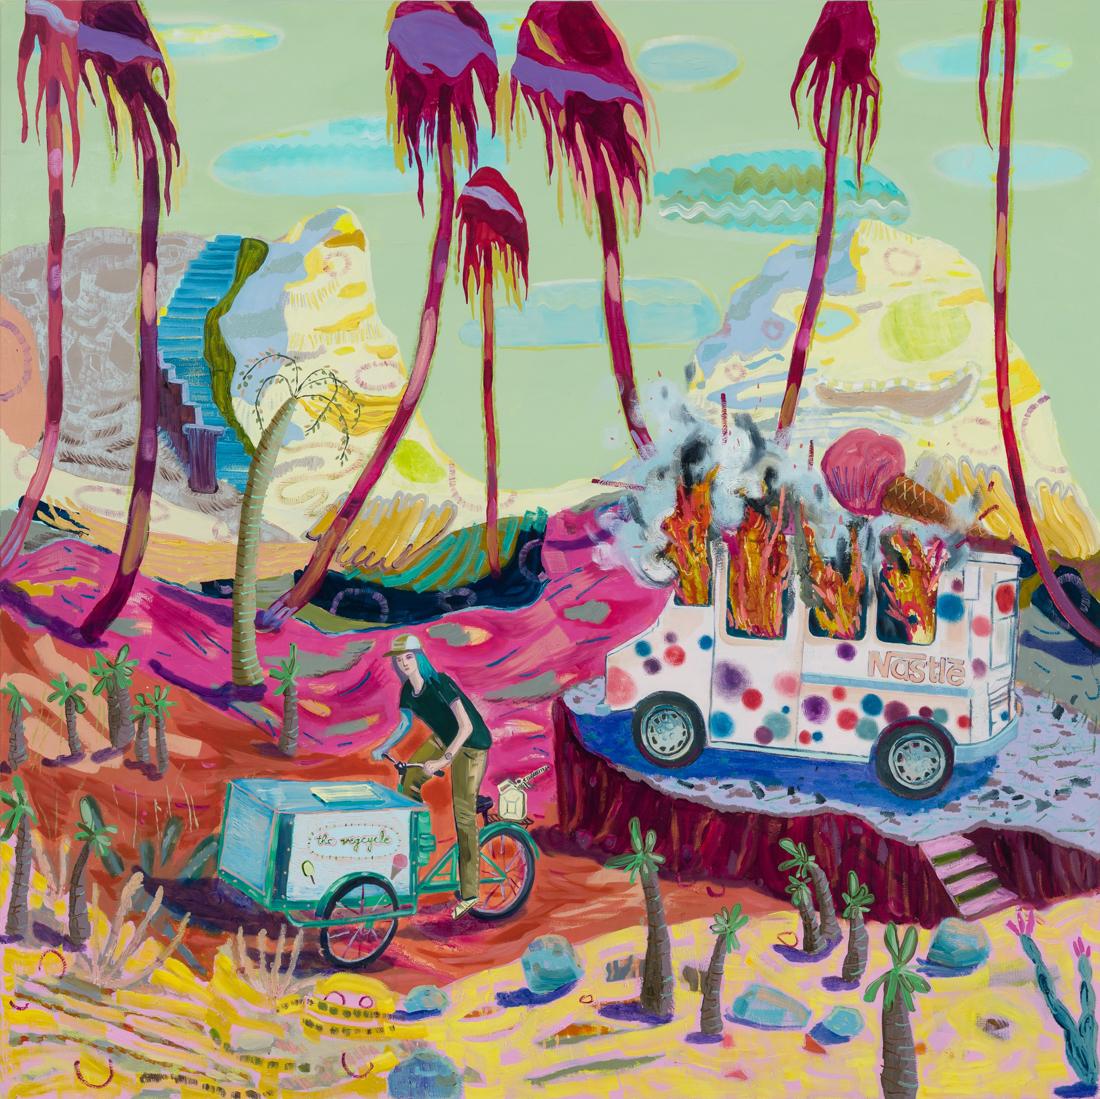 Melanie Daniel  Guerilla Ice , 2018 Oil on canvas 48 x 48 in